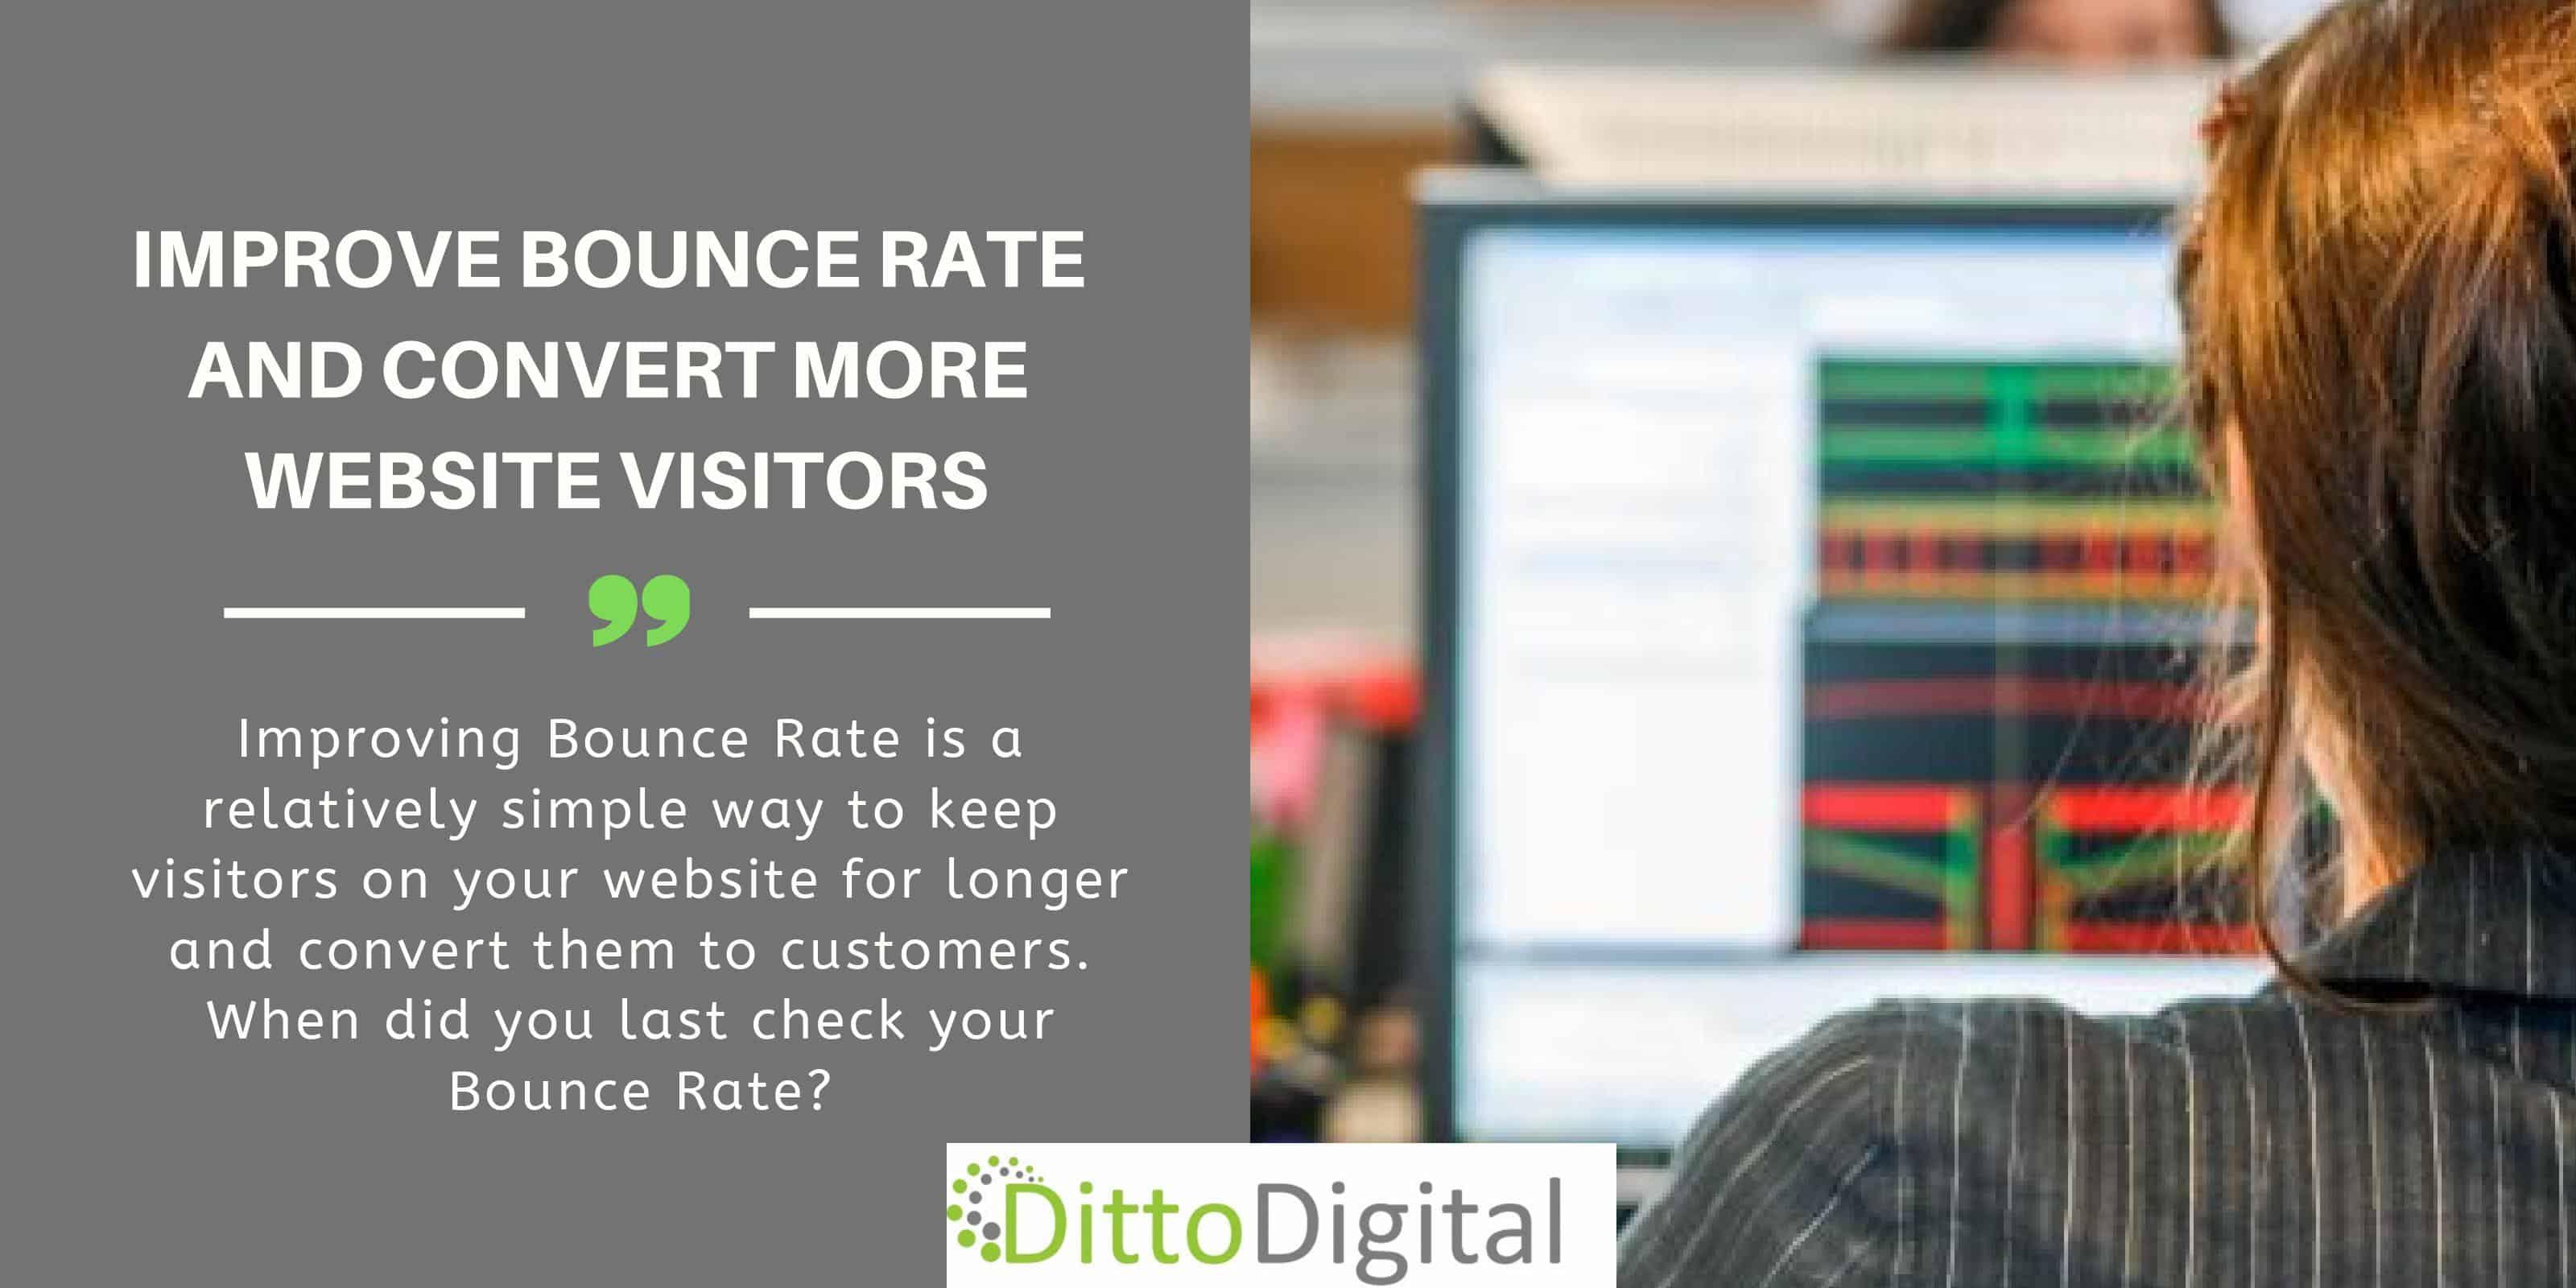 LinkedIn Post - Improve Bounce Rate - DittoDigital